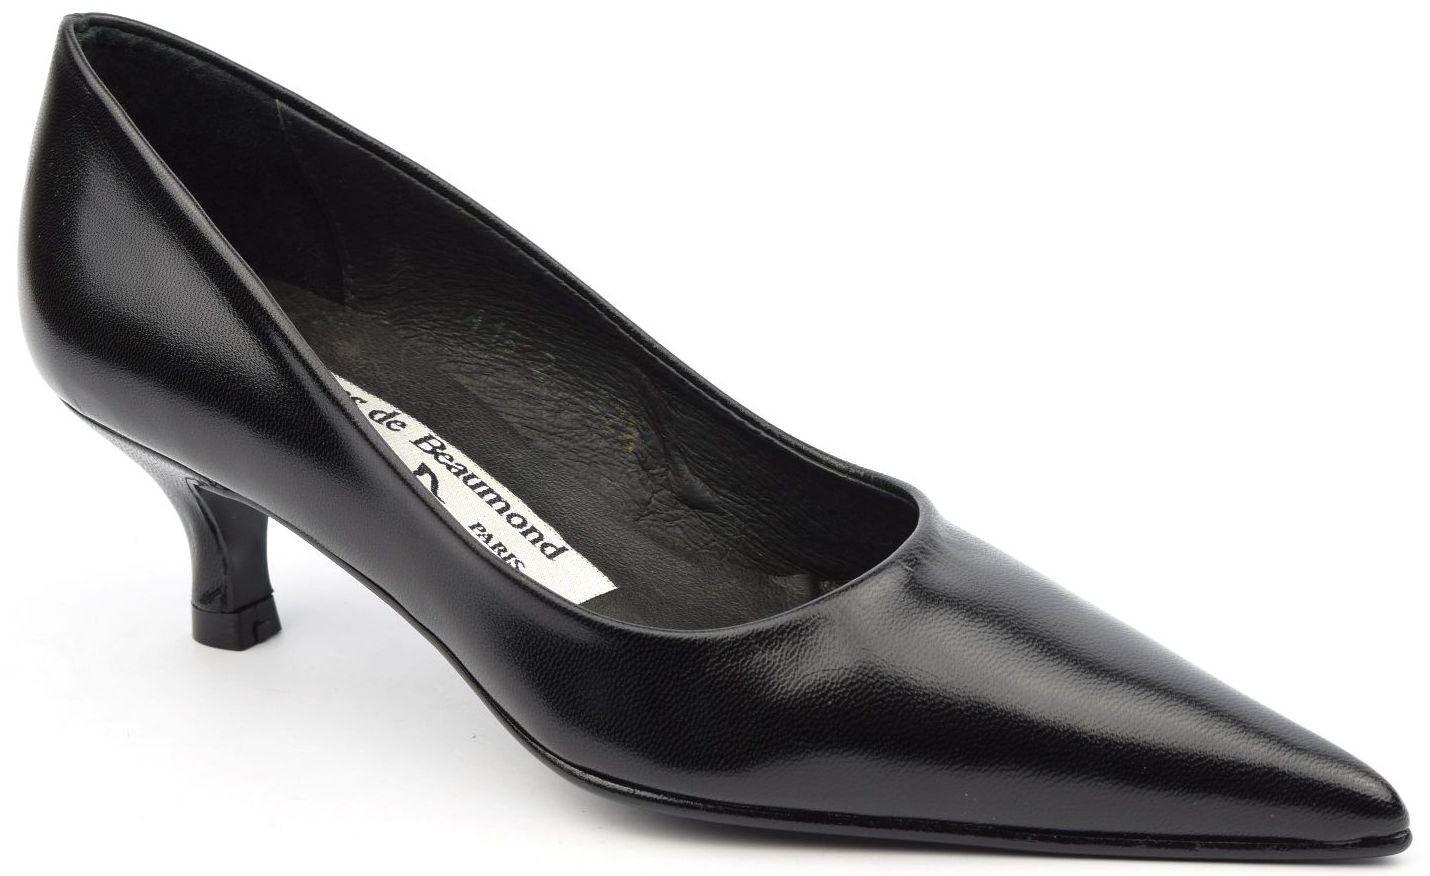 Escarpins cuir, noires,bouts pointus, Yves de Beaumond